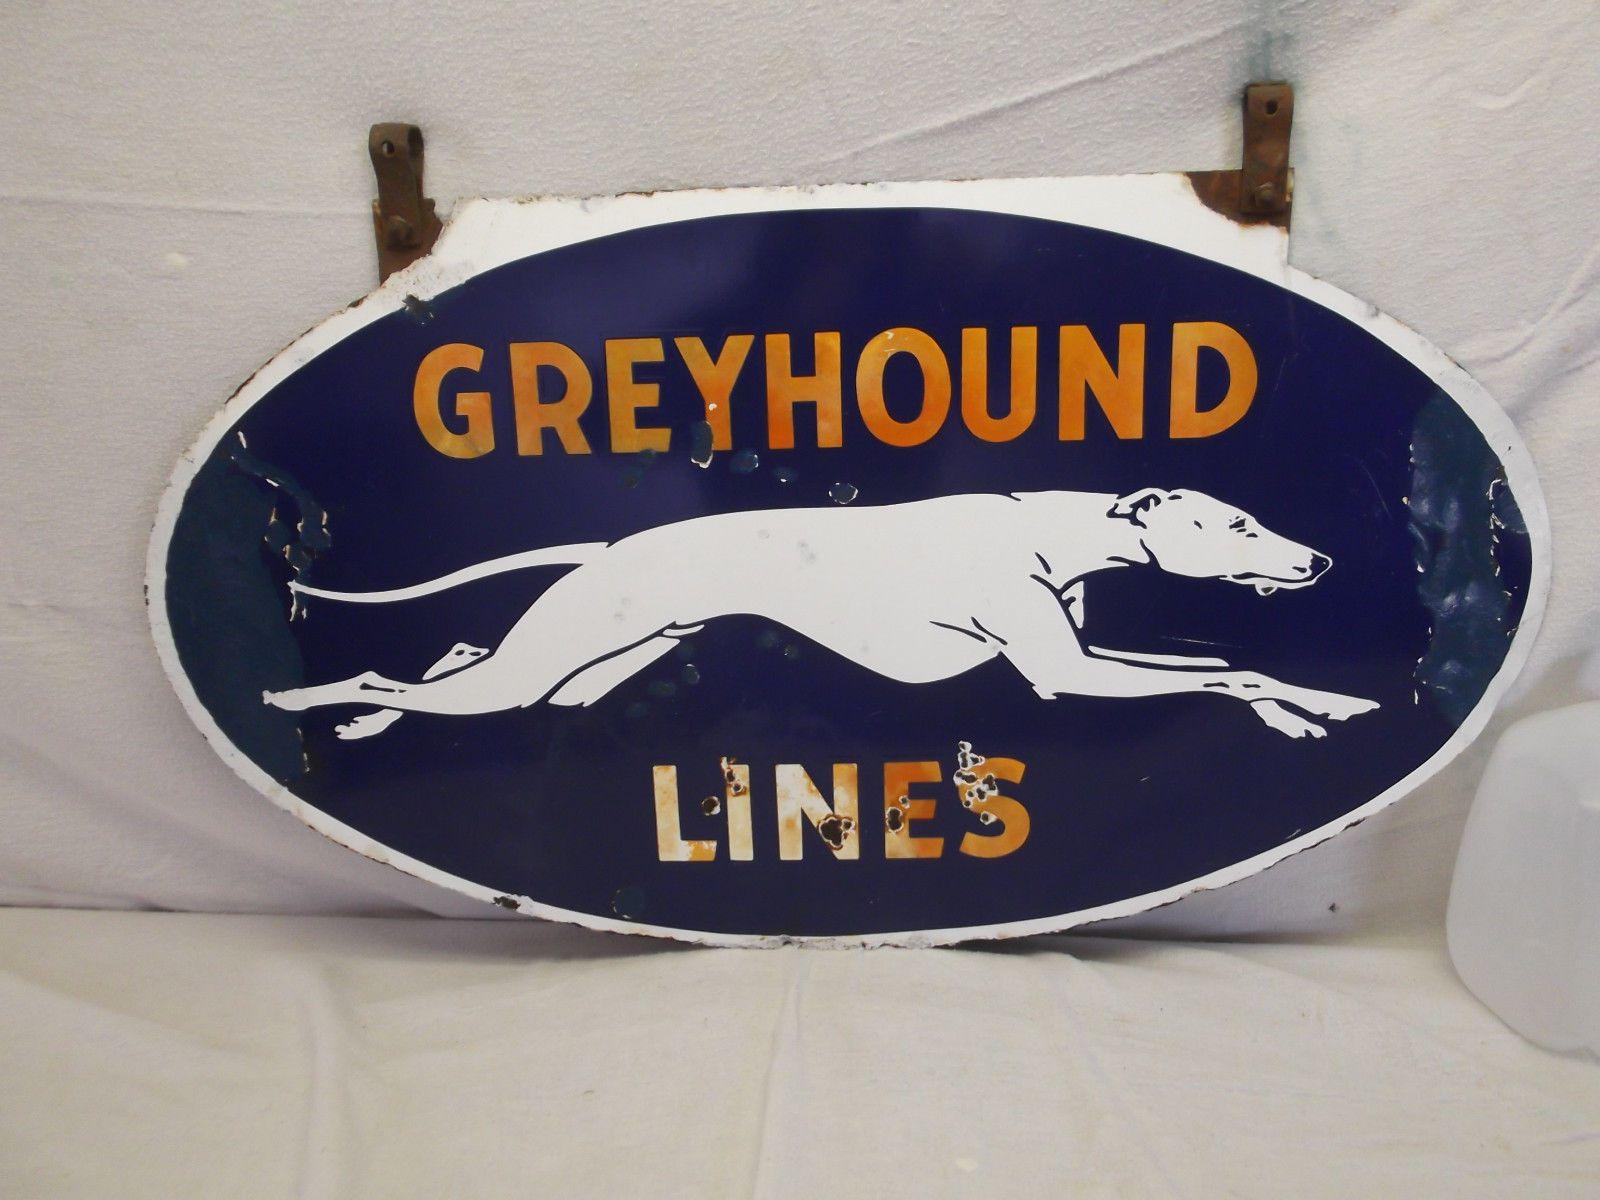 Greyhound Vintage Porcelain Sign Old Antique Double Sided Bus Lines